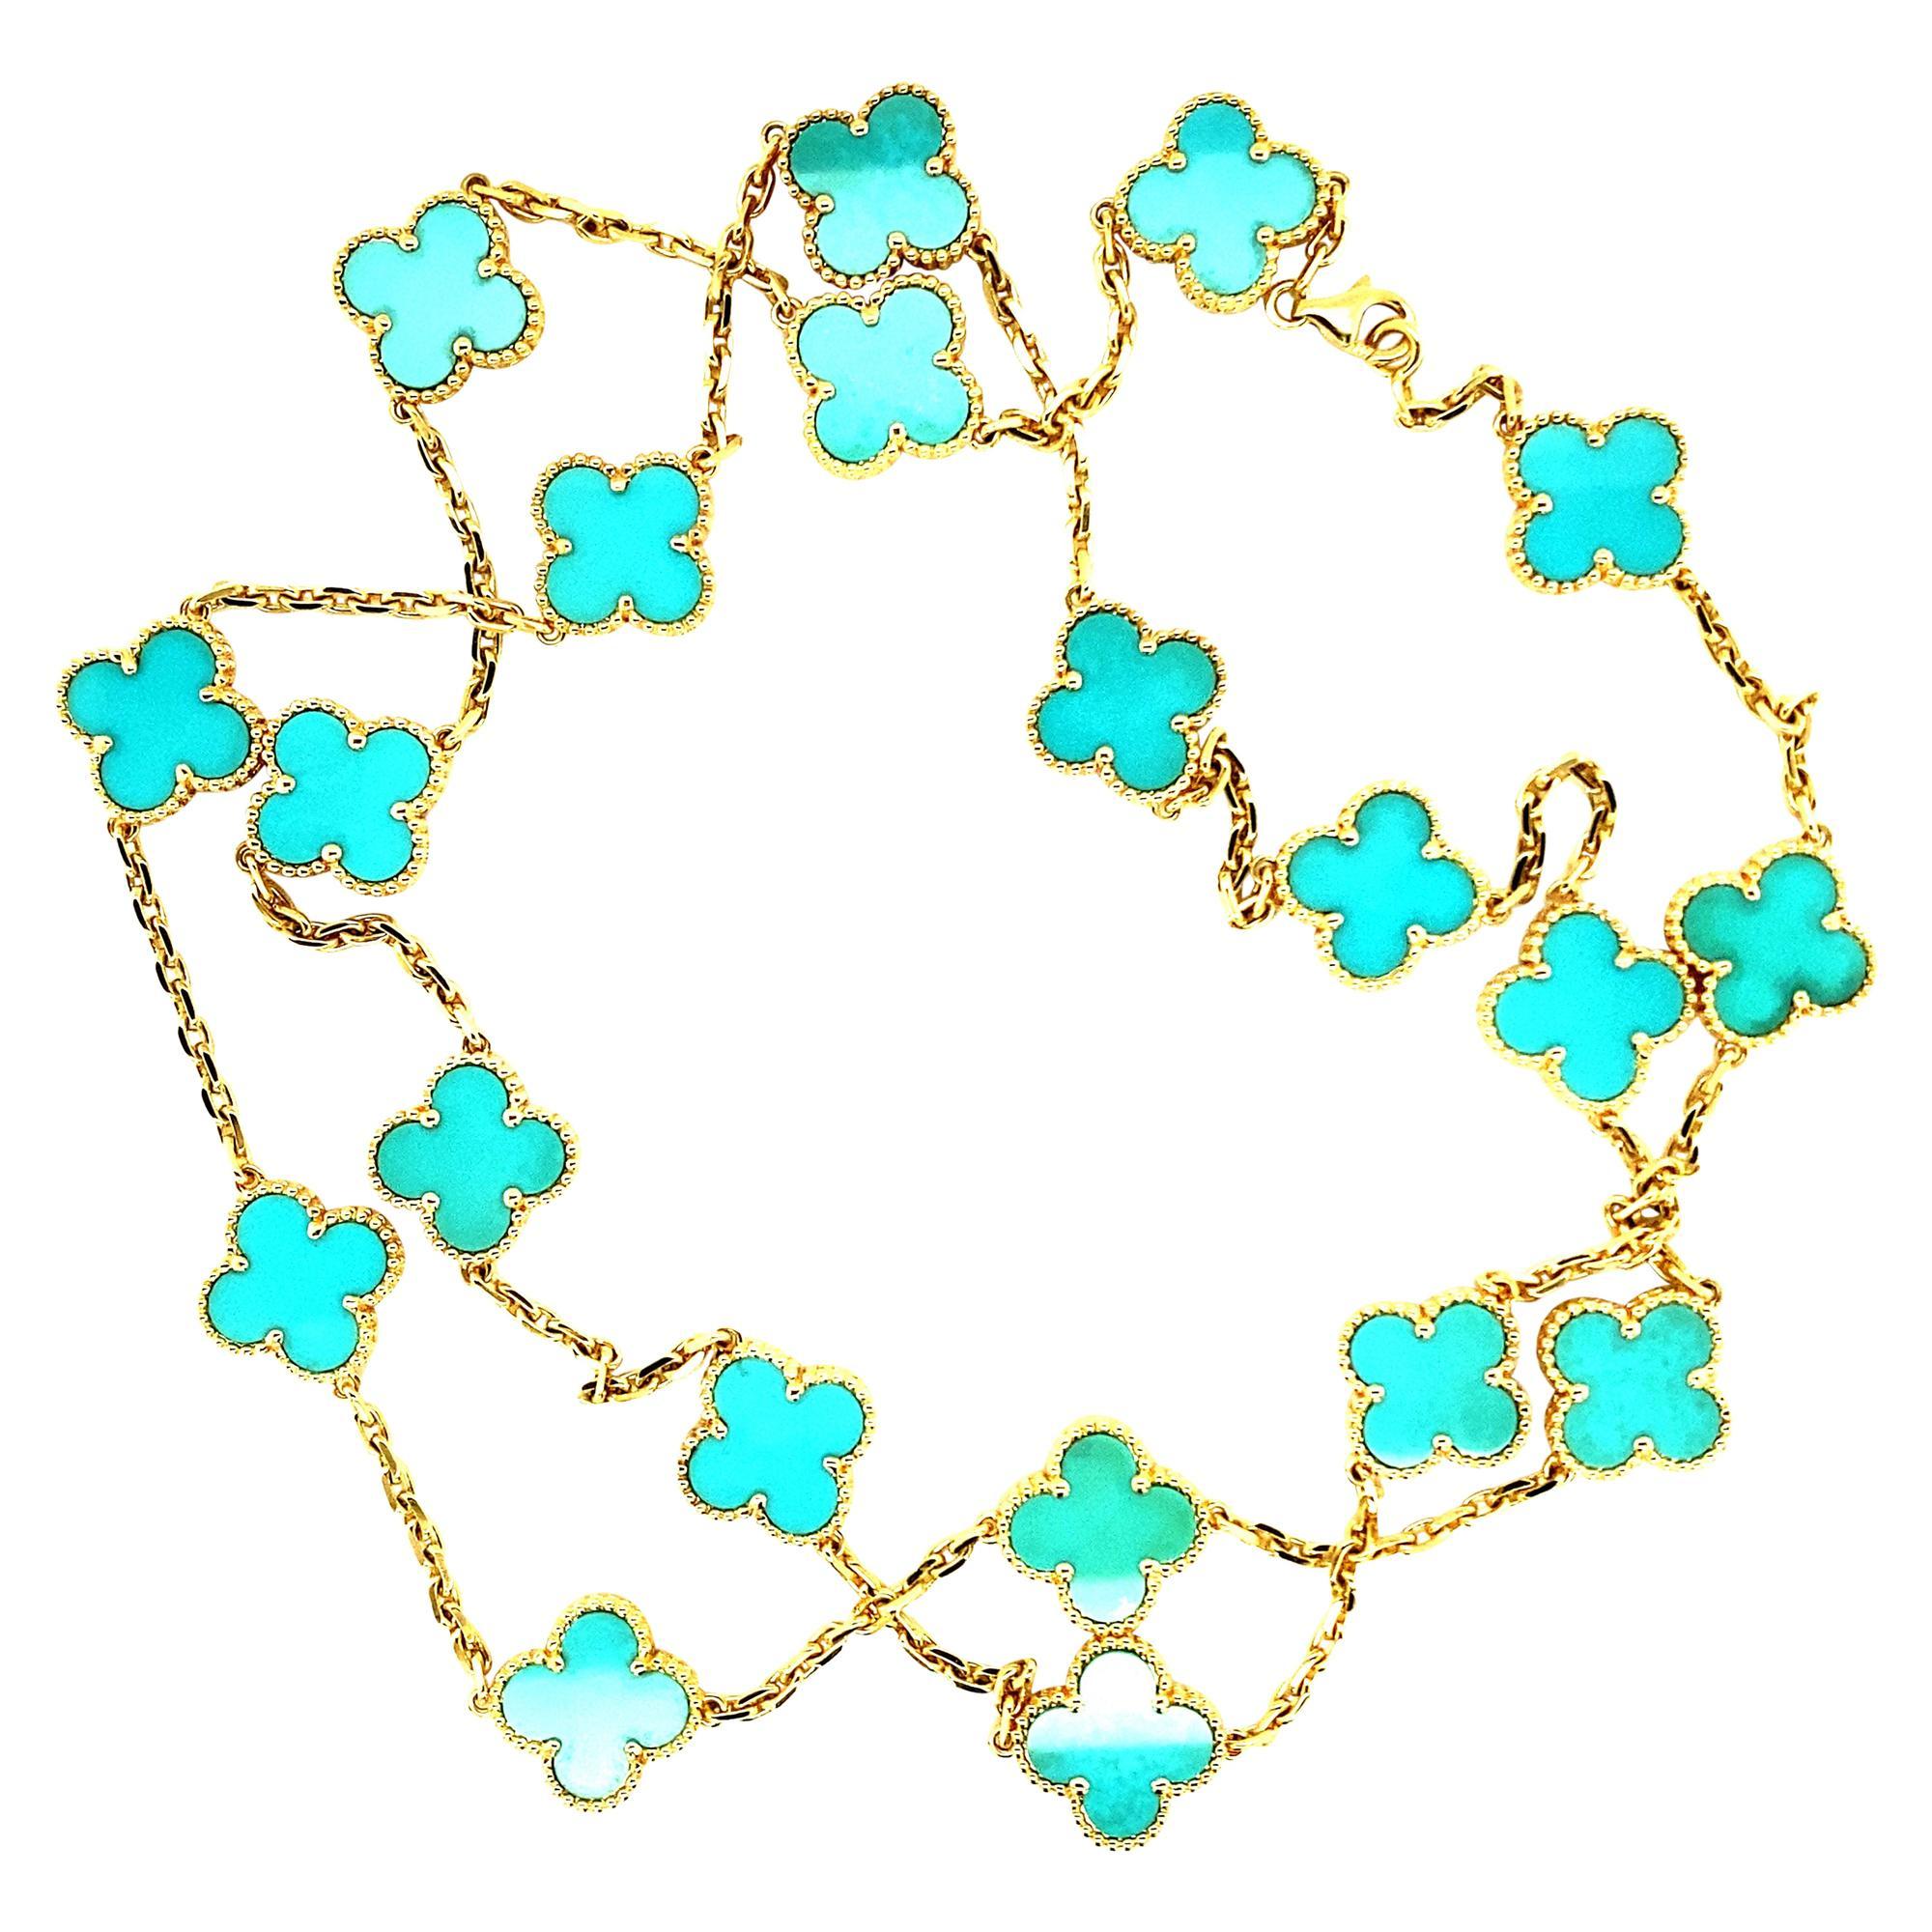 Van Cleef & Arpels Vintage Alhambra Necklace 20 Turquoise Motifs